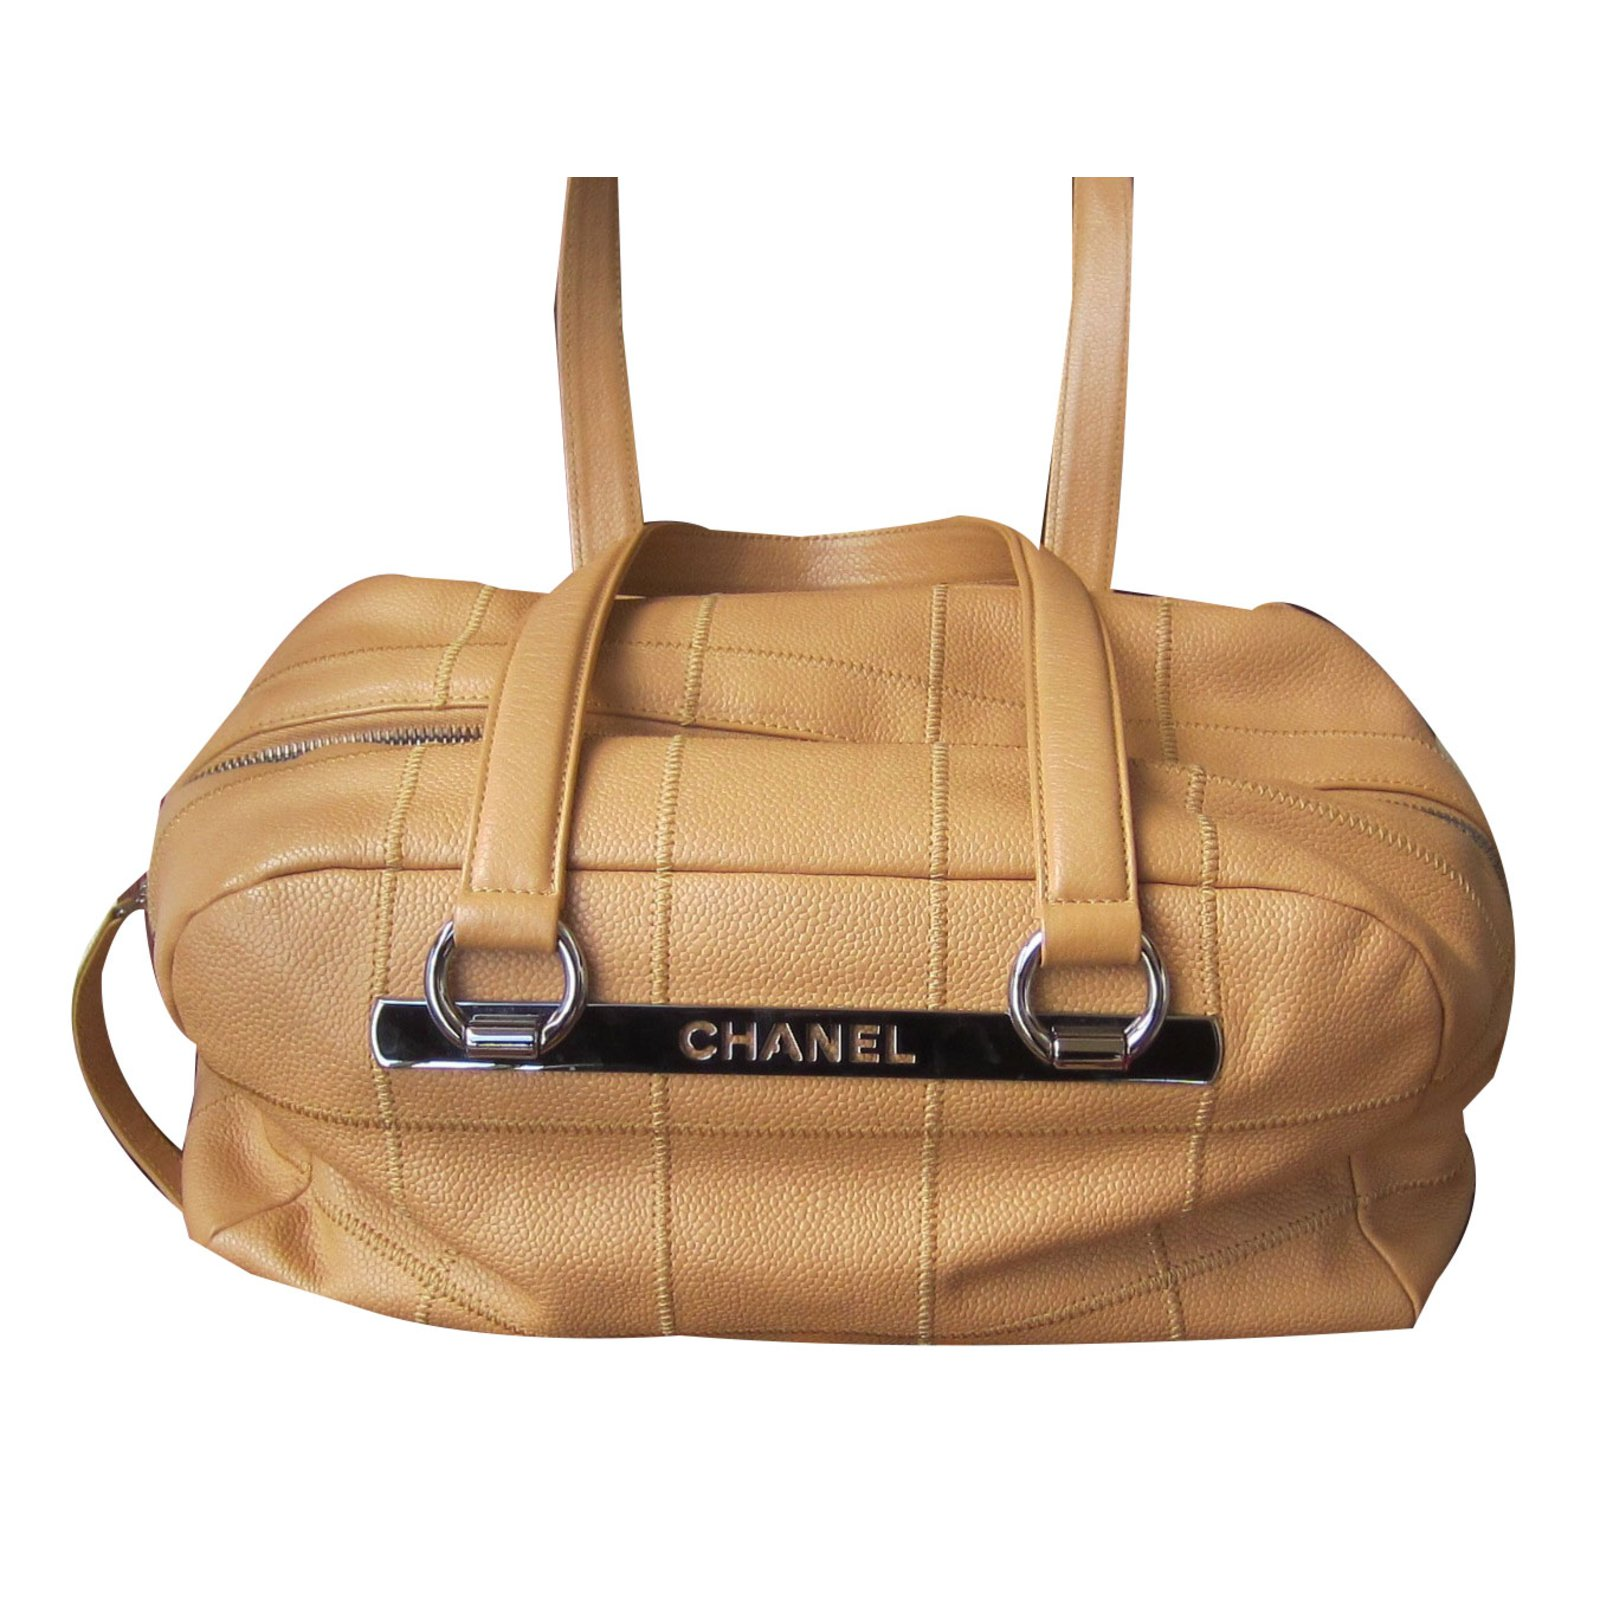 Chanel Bowling Bag Handbags Leather Beige Ref 53878